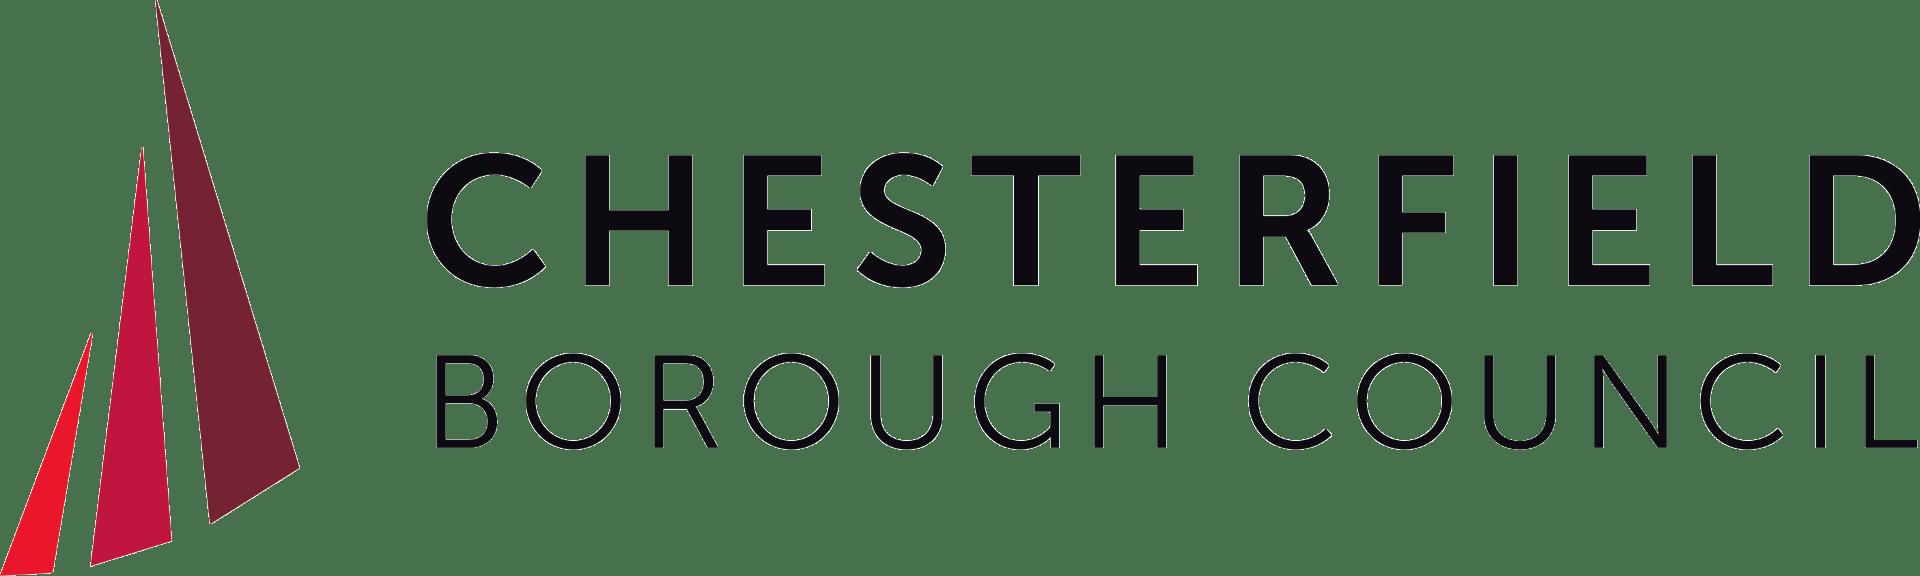 Chesterfield Borough Council